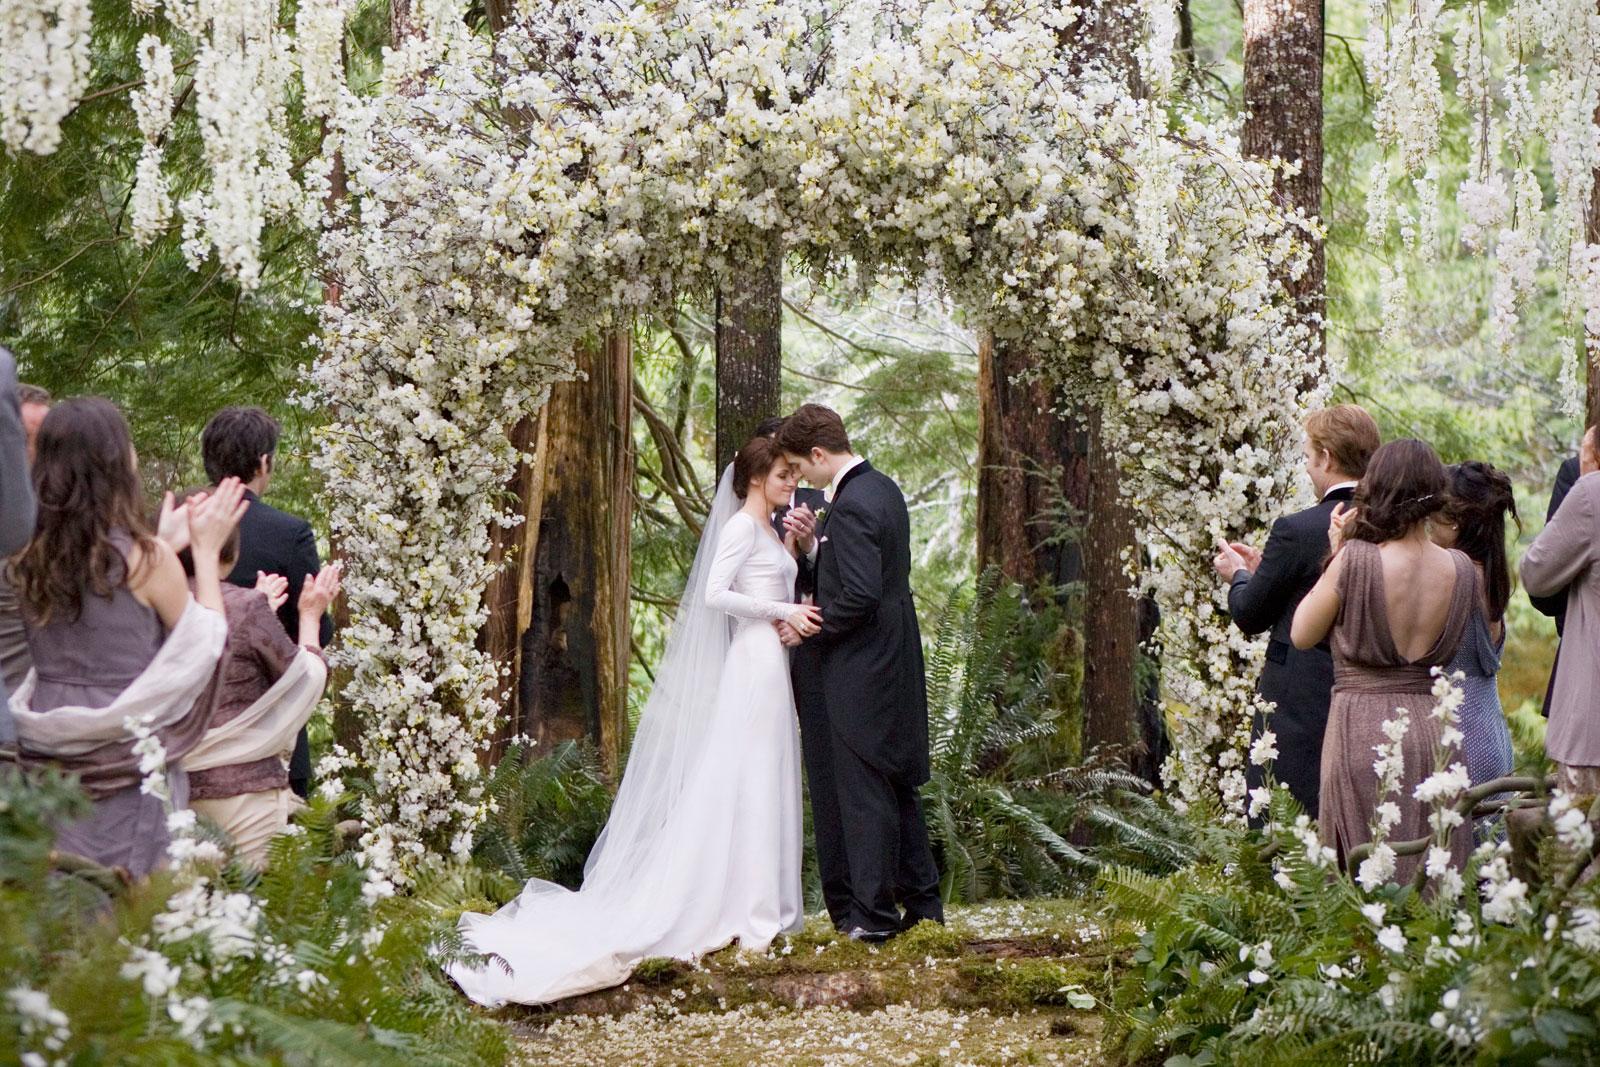 Bella Swans Twilight Wedding Dress Replica Hits Stores